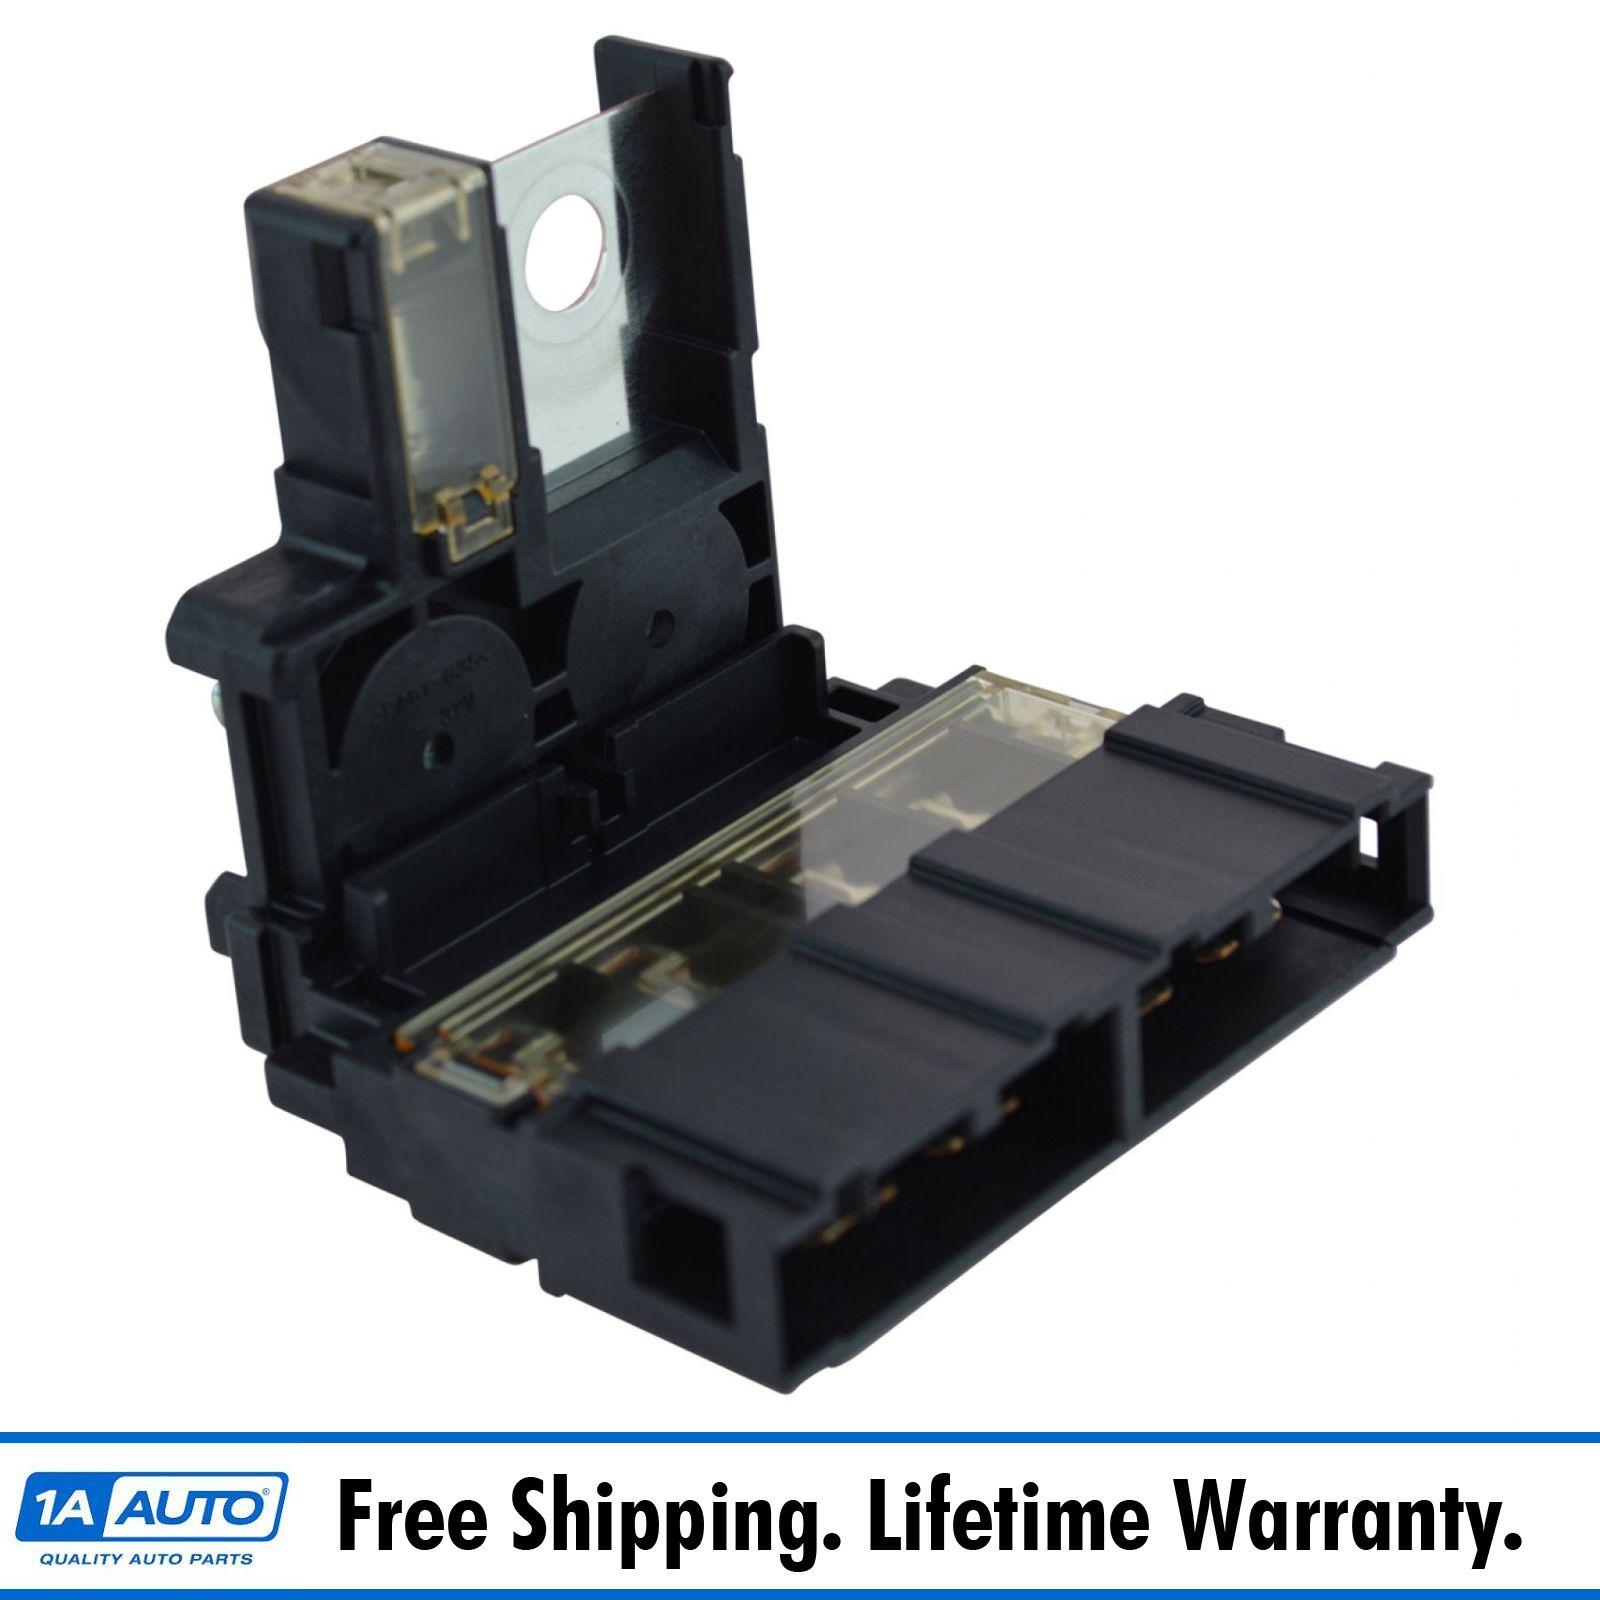 Dorman Battery Fuse Block Holder Link Connector For Nissan Maxima 2002 Box Cover Altima Murano